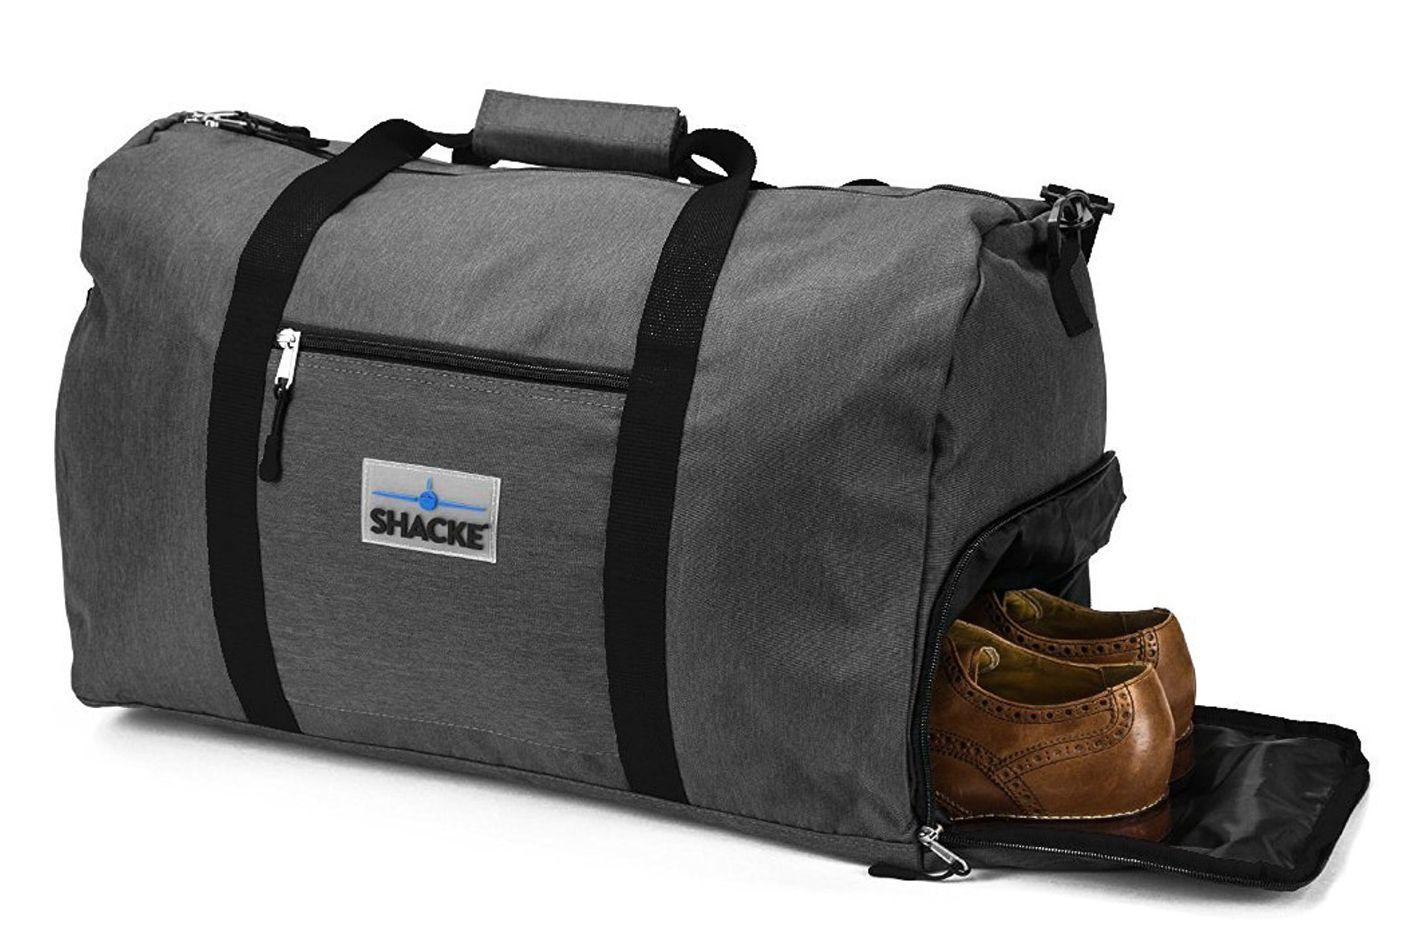 Shacke's Travel Duffel Express Weekender Bag